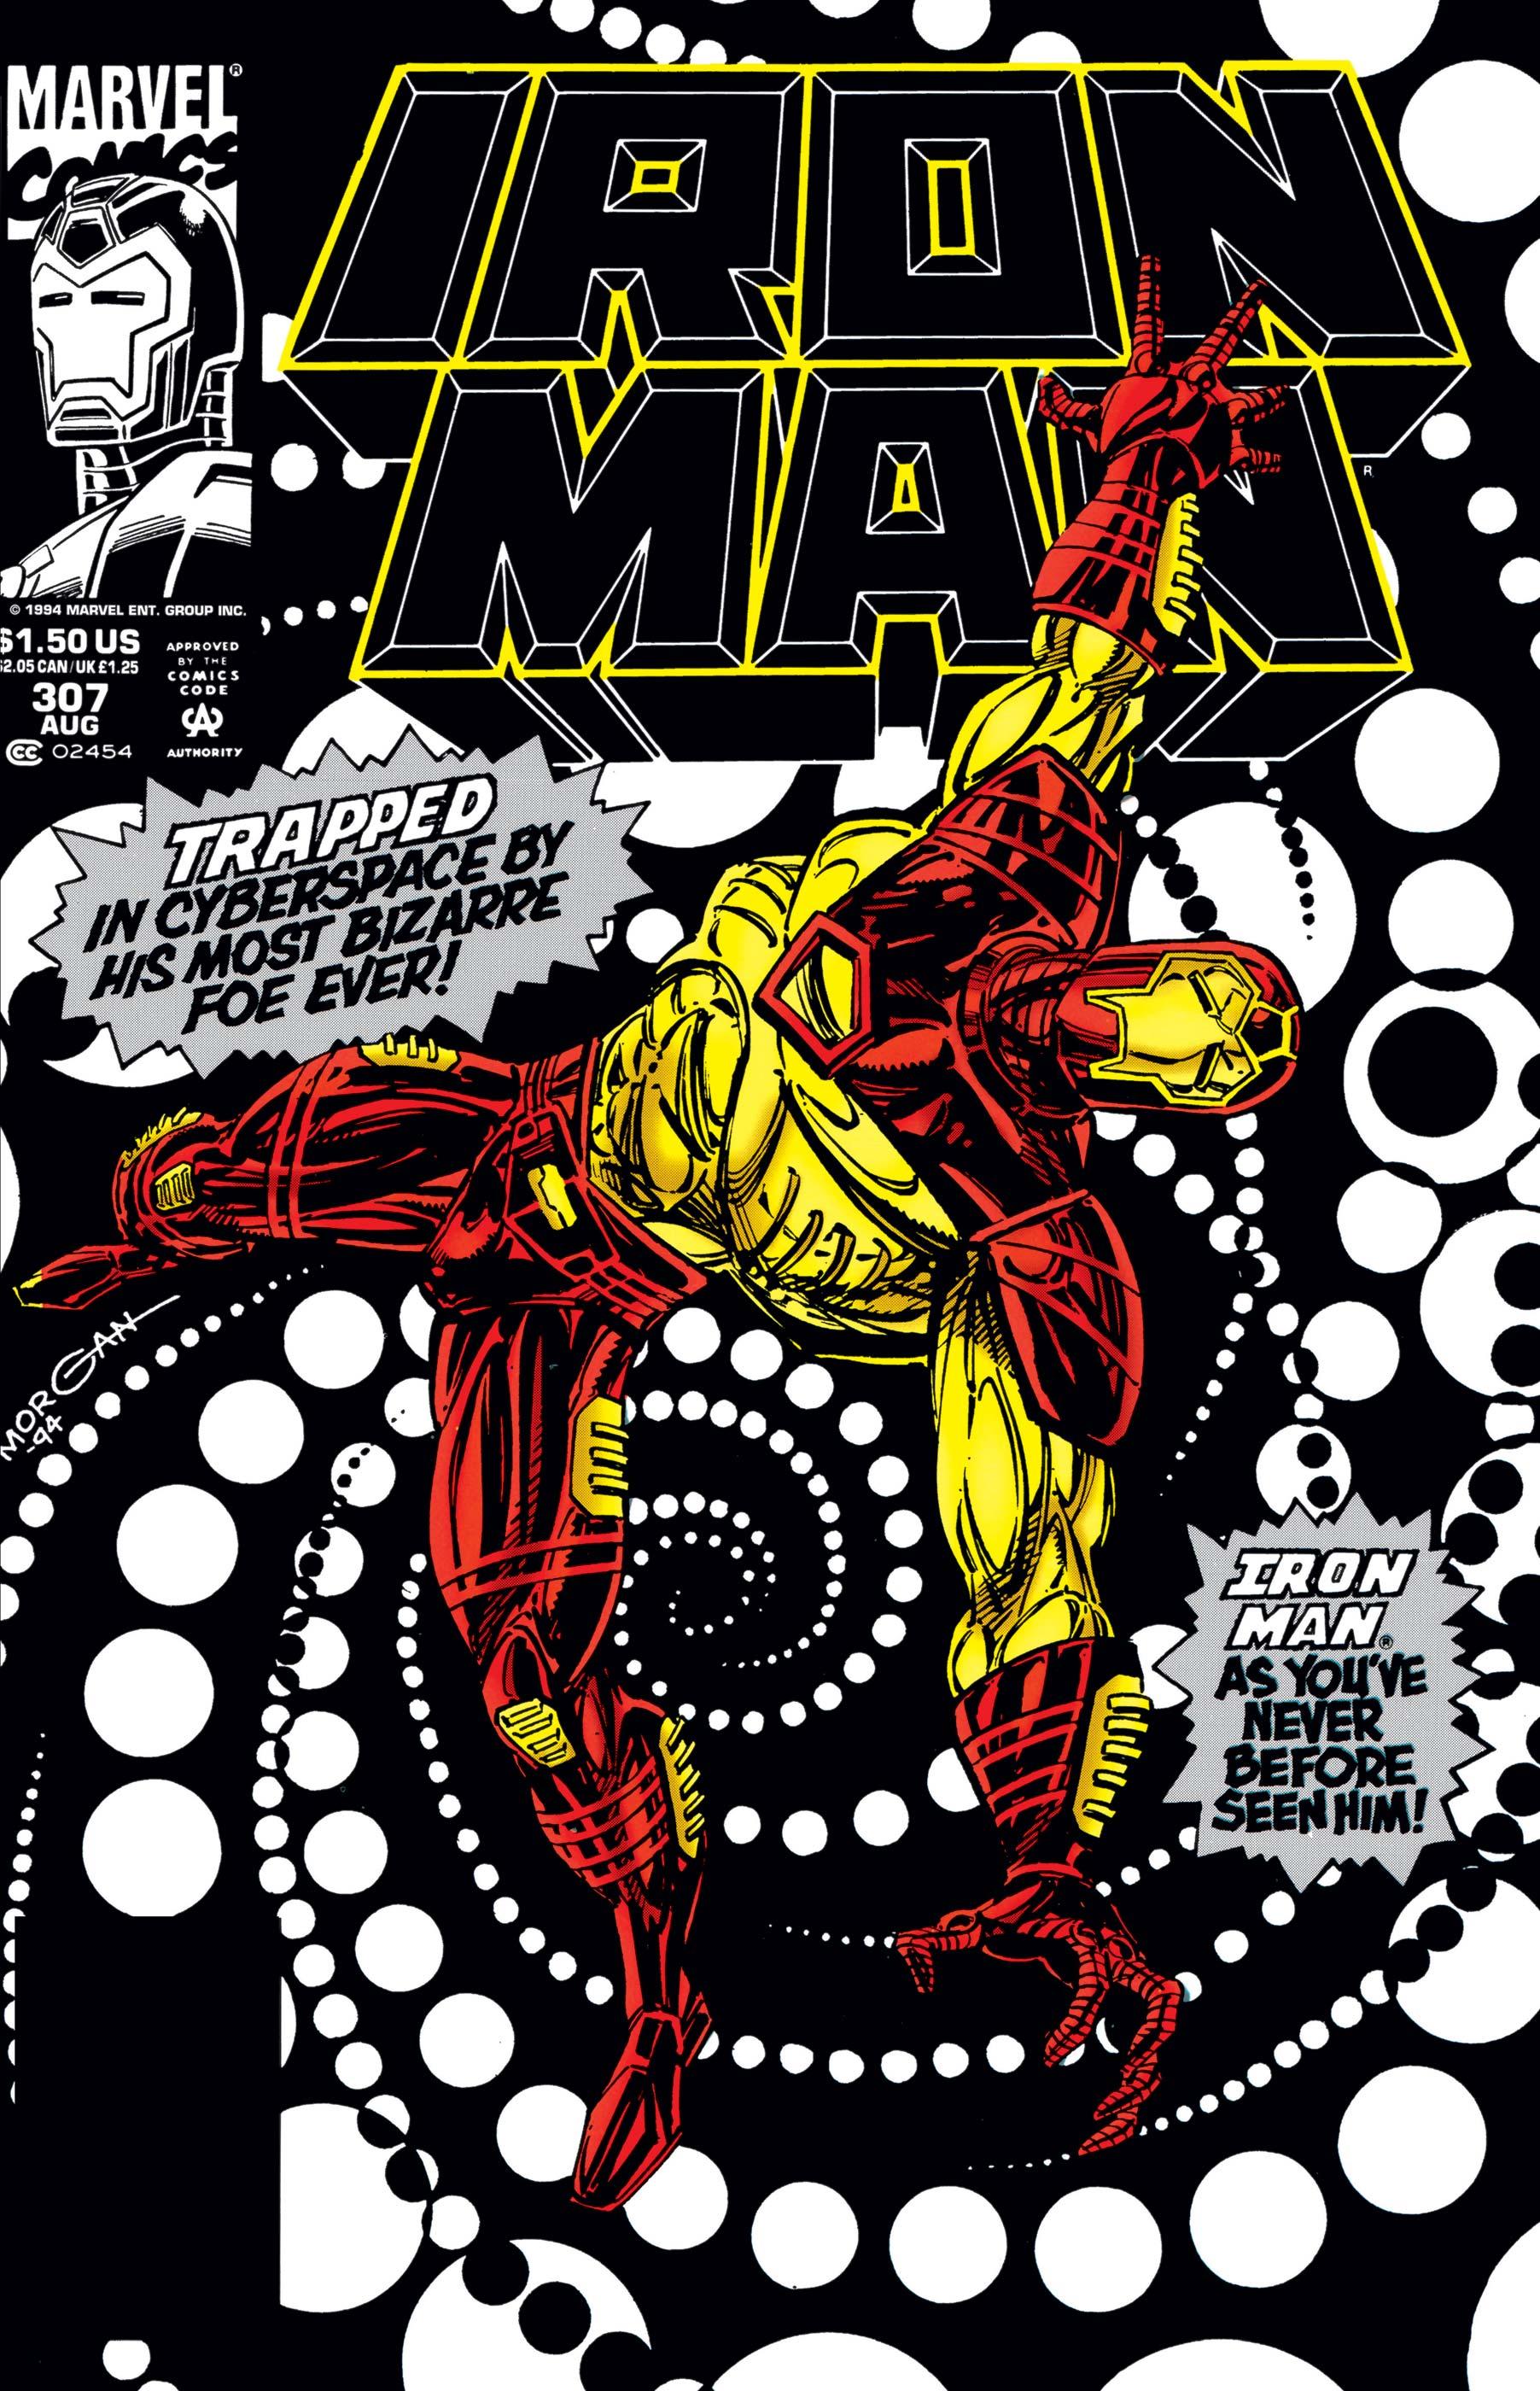 Iron Man (1968) #307